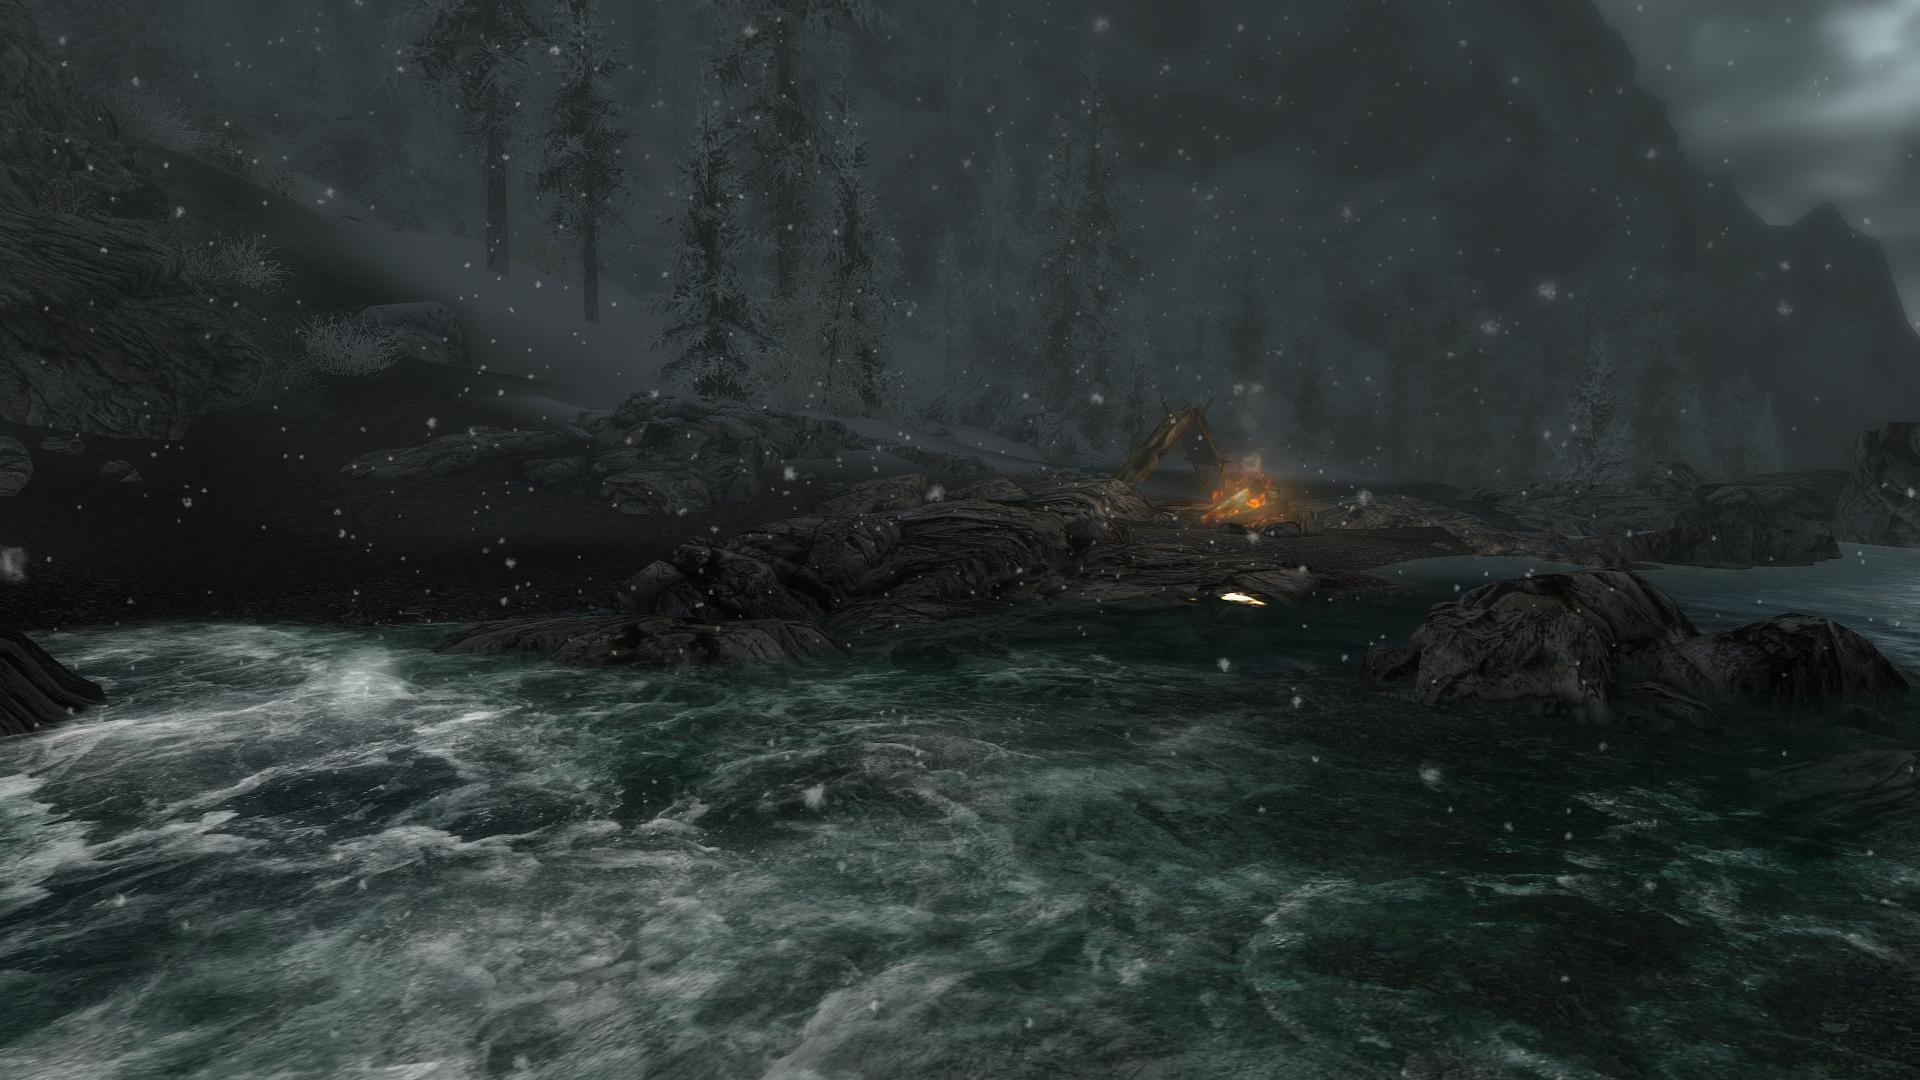 000194.Jpg - Elder Scrolls 5: Skyrim, the